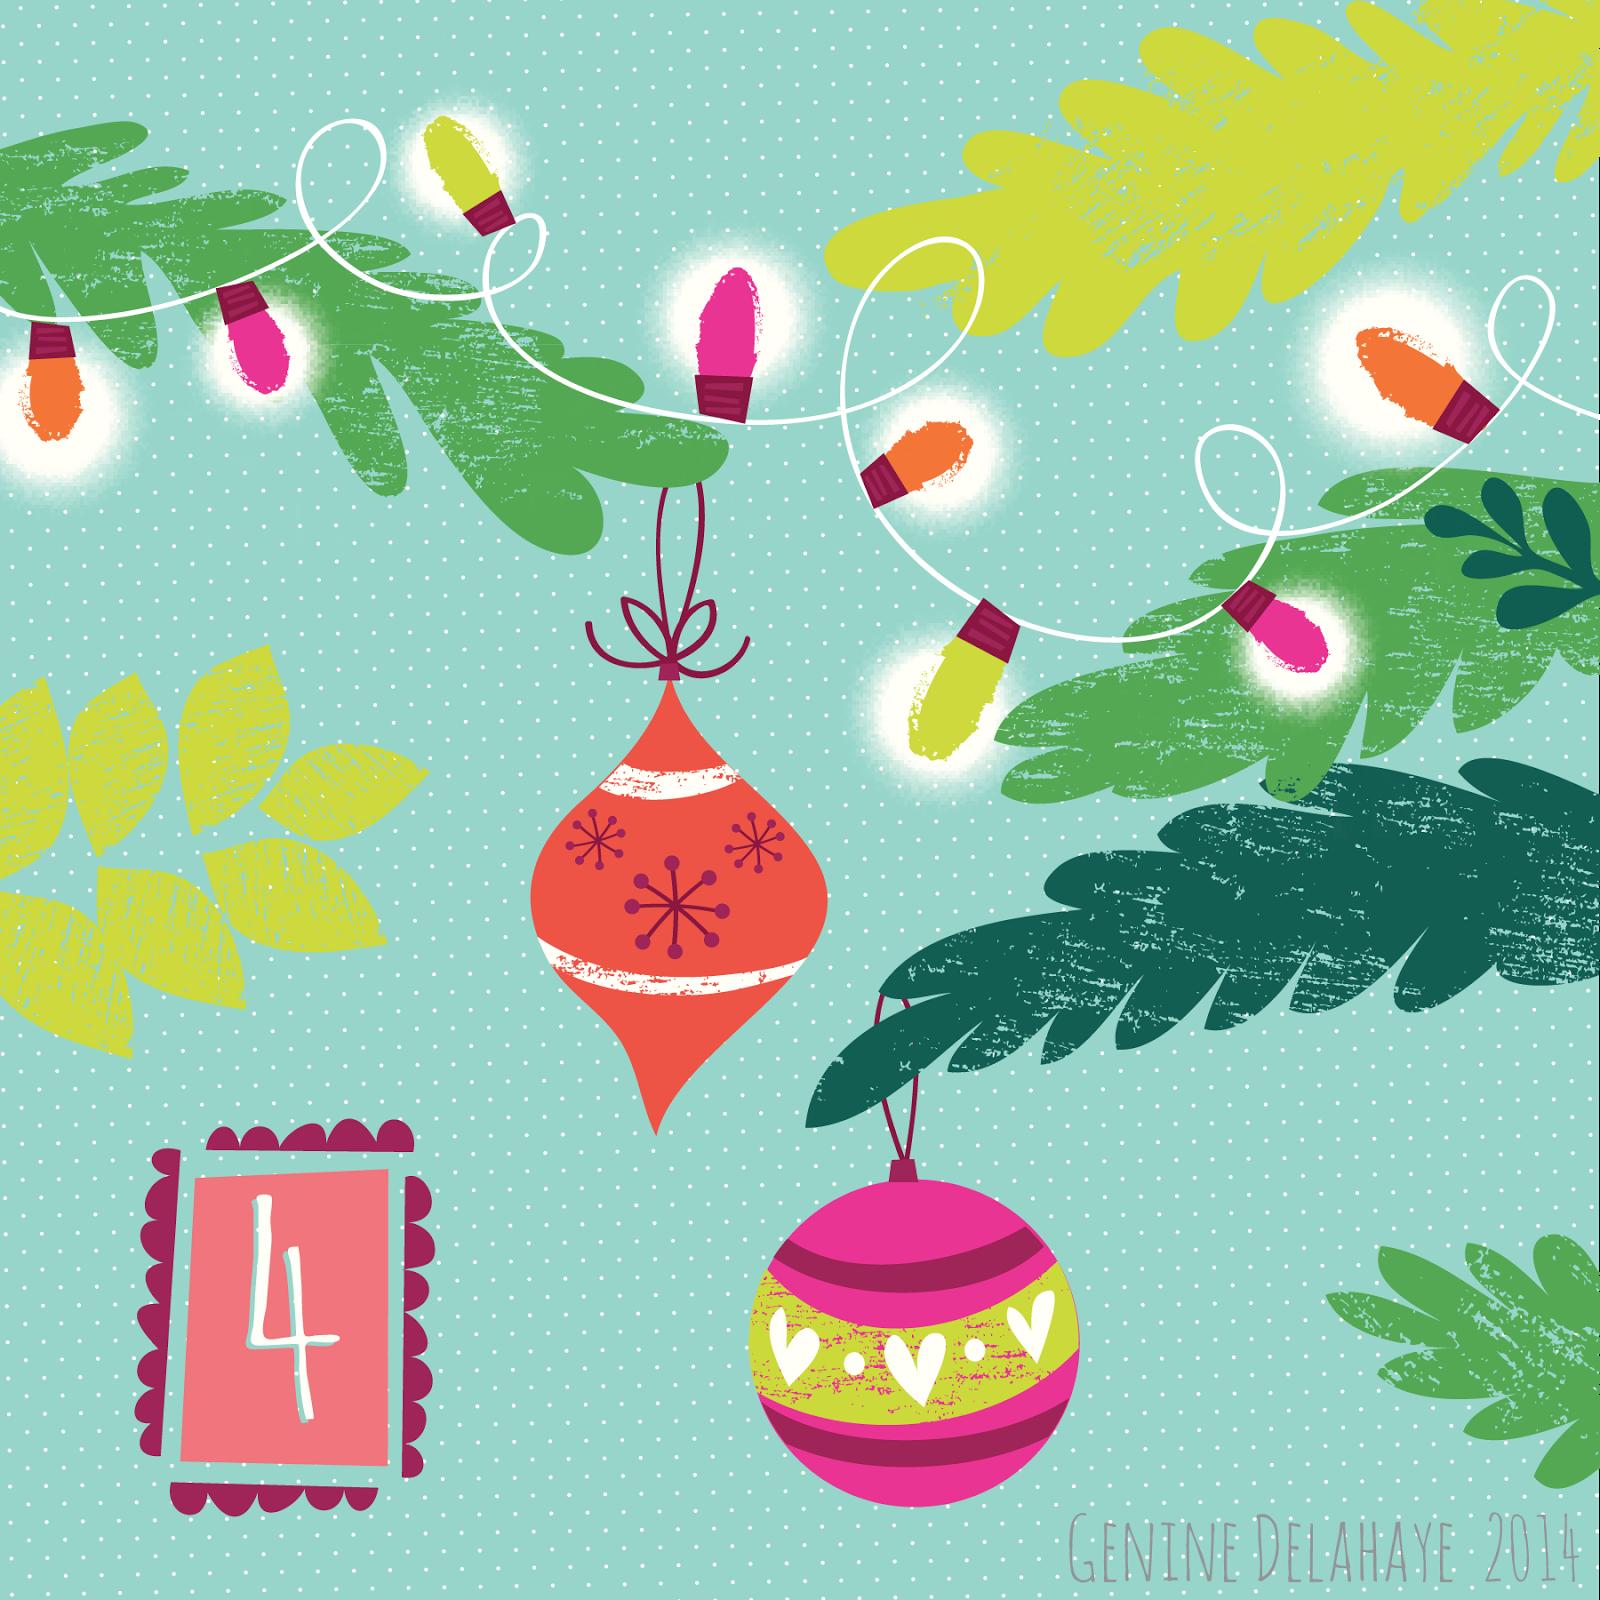 d3673ef8226a Genine Delahaye childrenswear designer blog Christmas Calendar